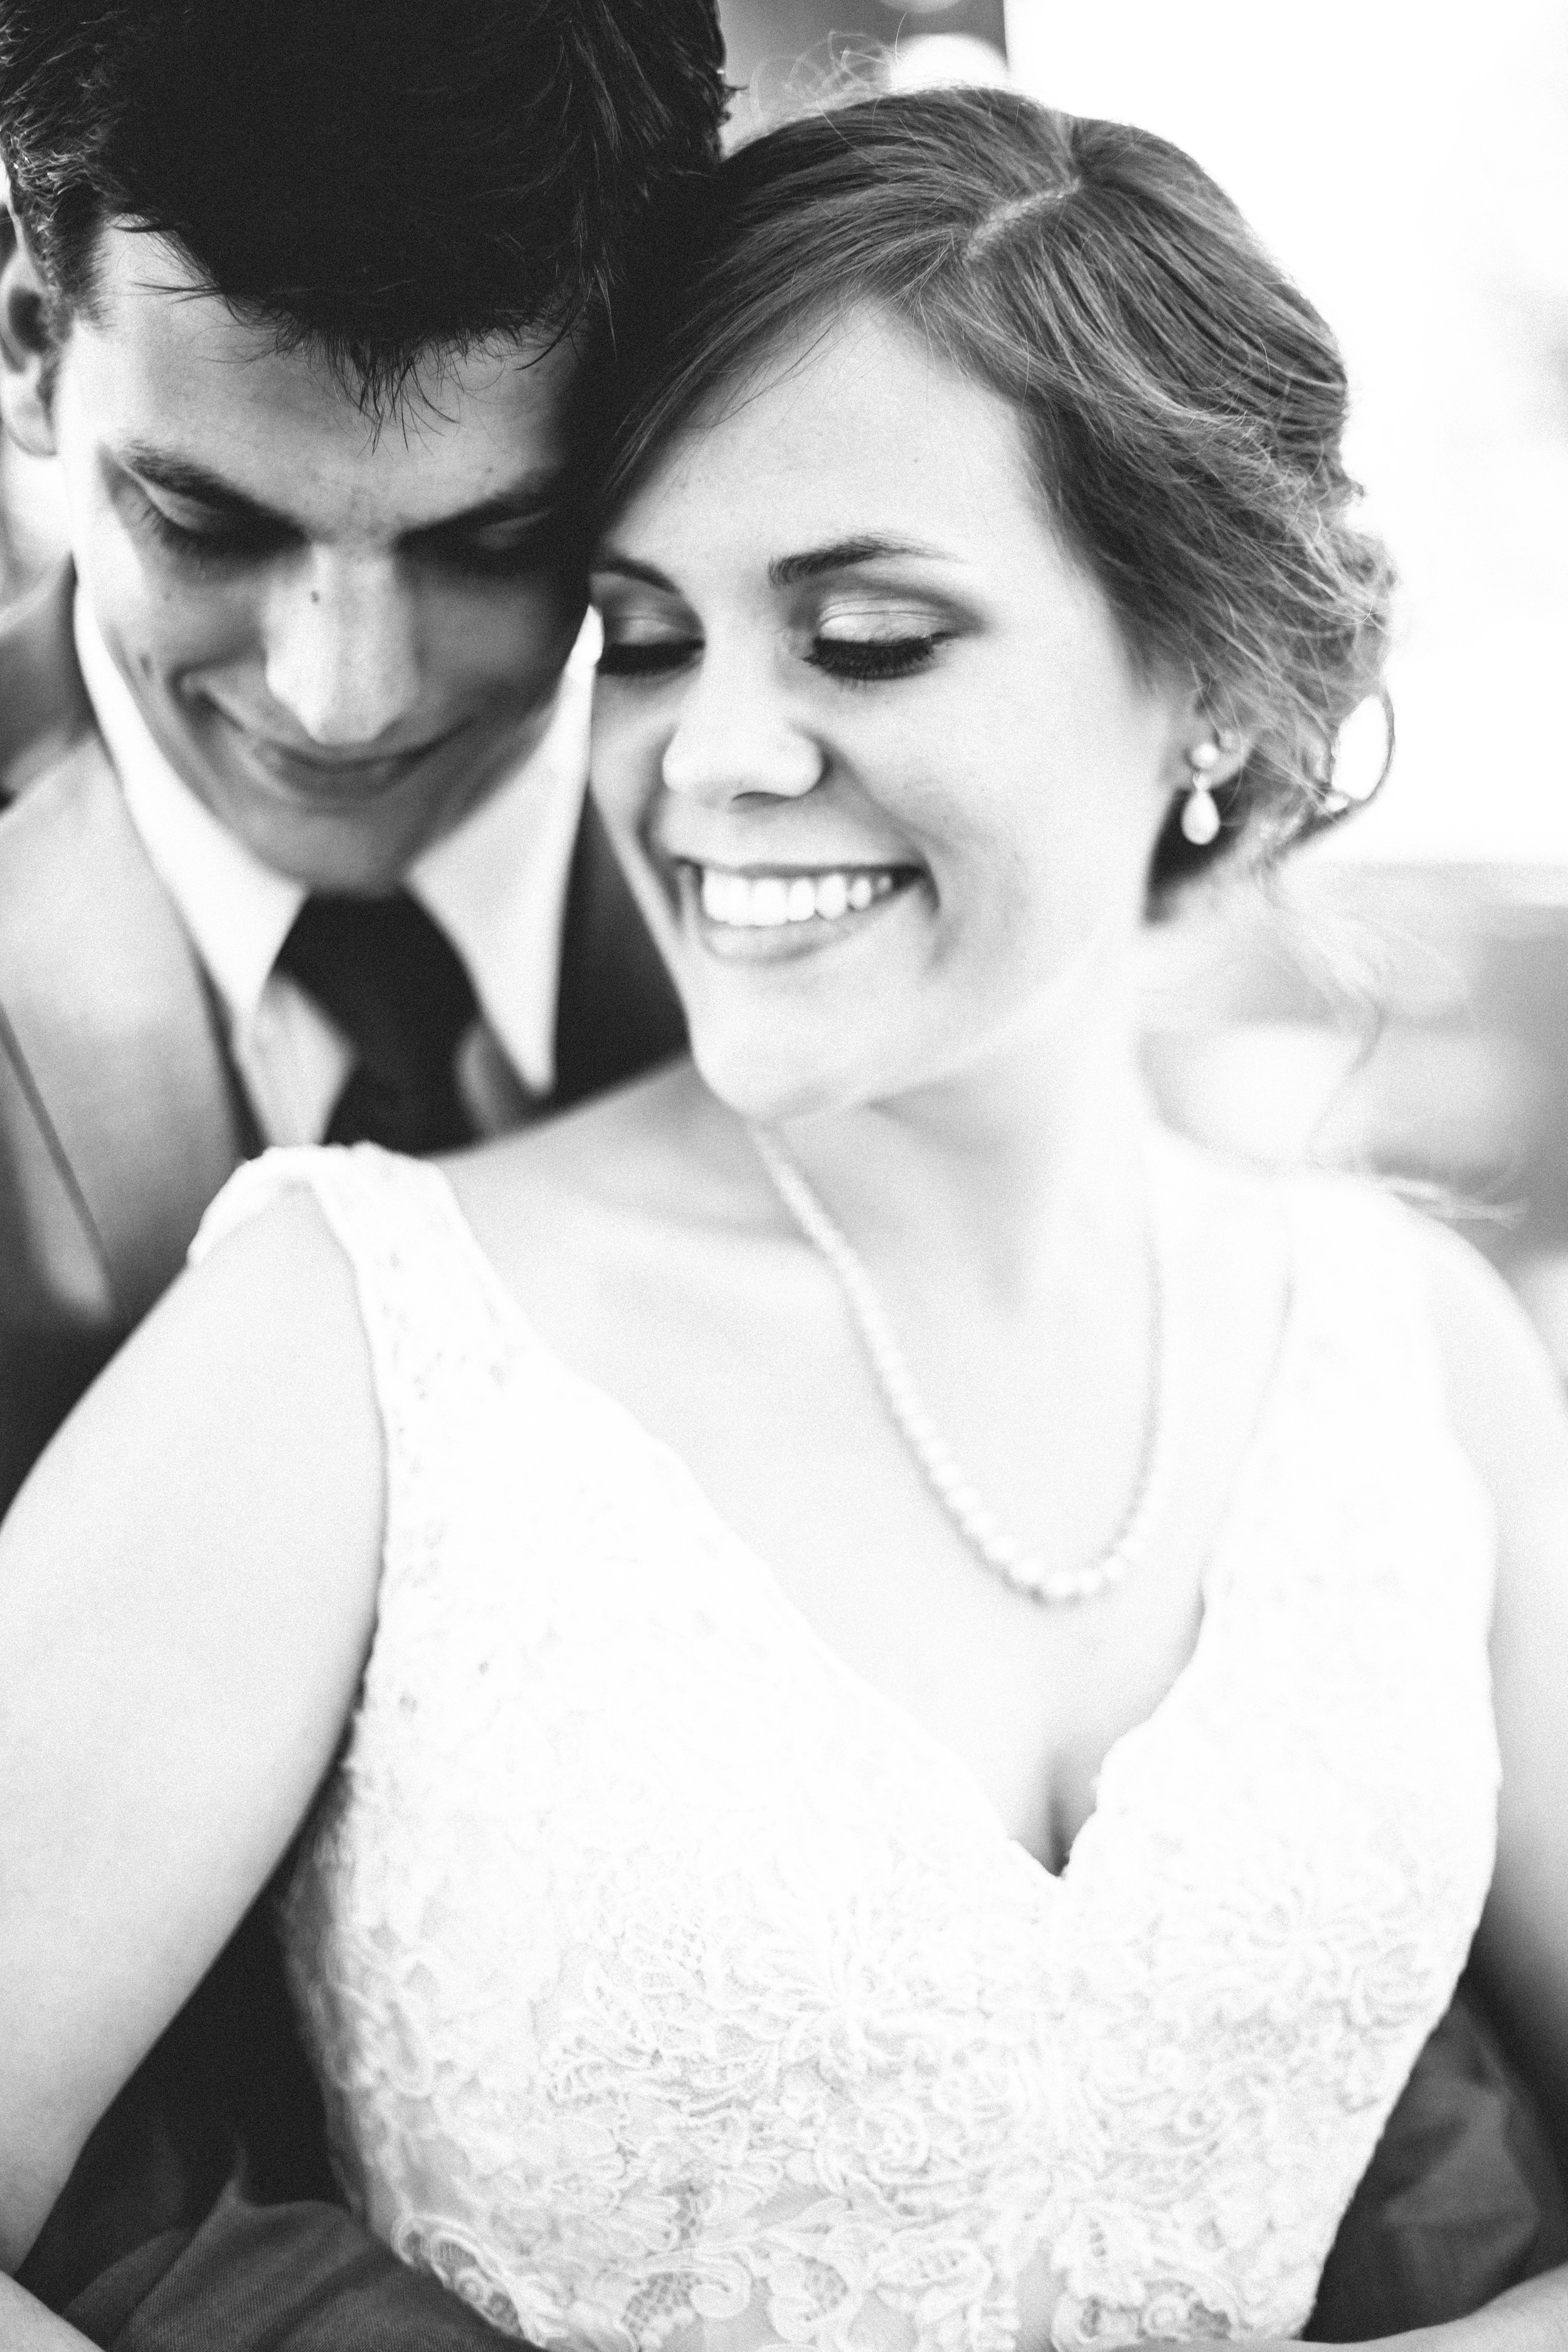 Jordan & Shantel Married - Idaho - Corrie Mick Photography-101.jpg